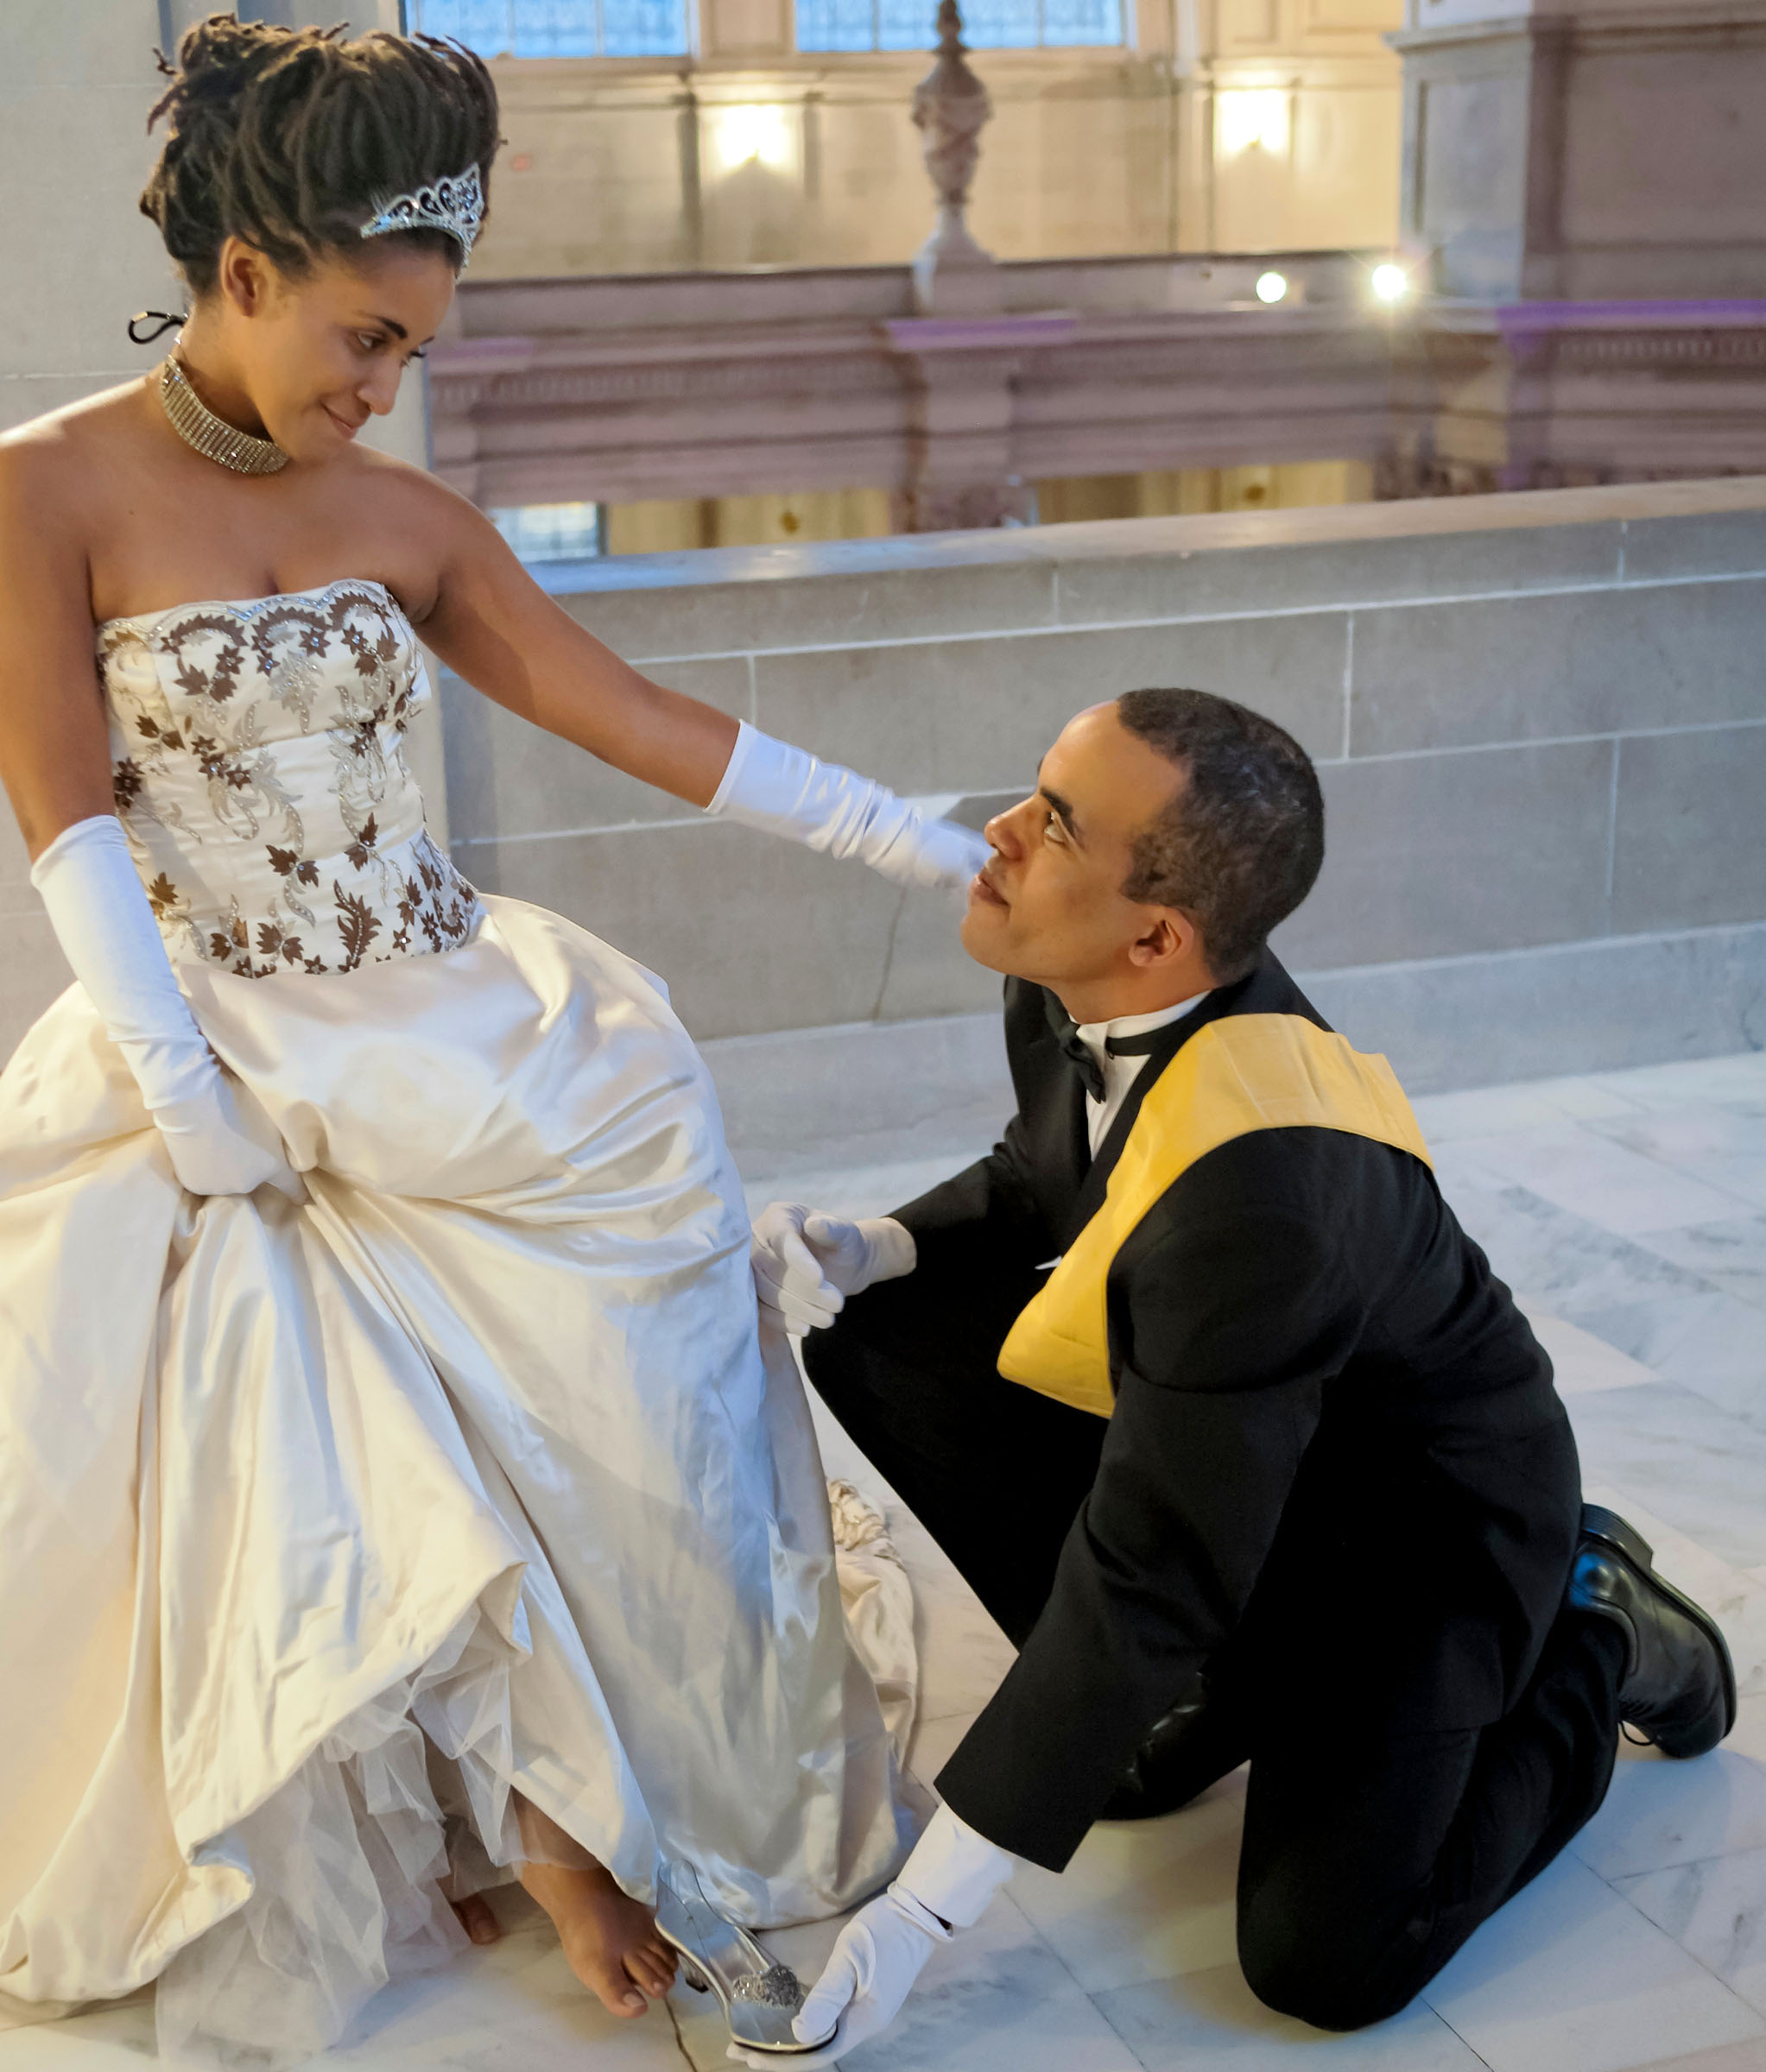 https://i0.wp.com/www.african-americanshakes.org/Assets/PressPhotos/Cinderella_2011/Cinderella11-42.jpg